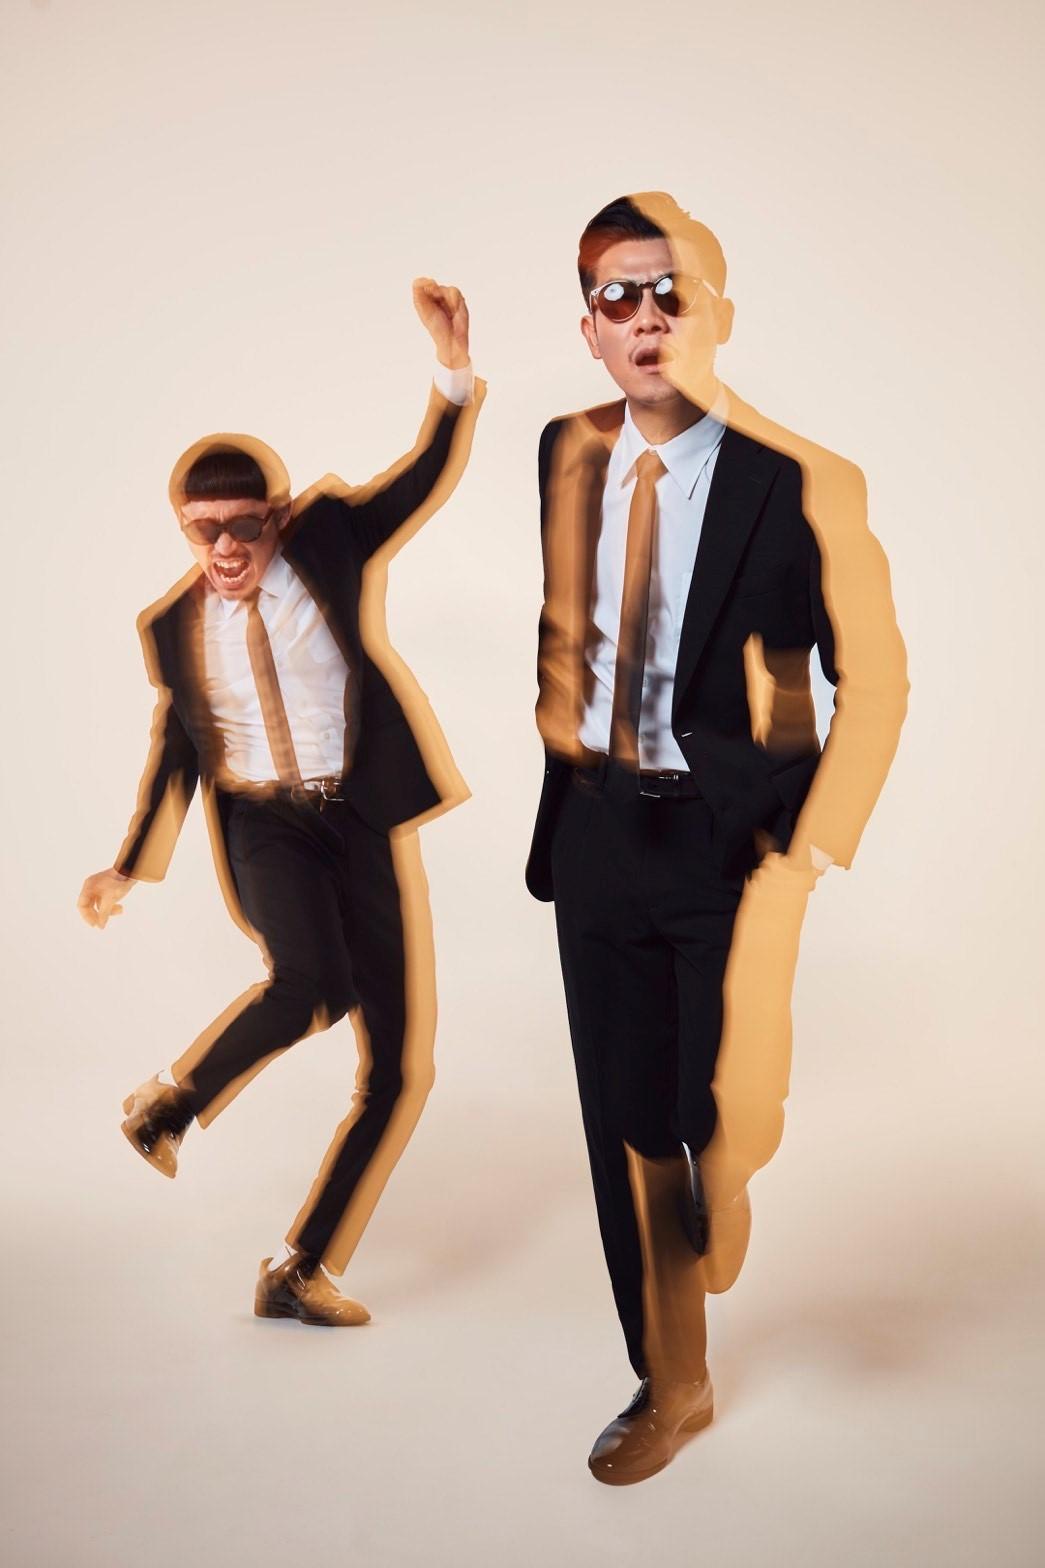 C&K、8月5日発売ニューシングル「アサトヒカリ」発売記念、秘蔵LIVE映像をC&Kの解説トークと共にお送りするYouTubeプレミア公開決定サムネイル画像